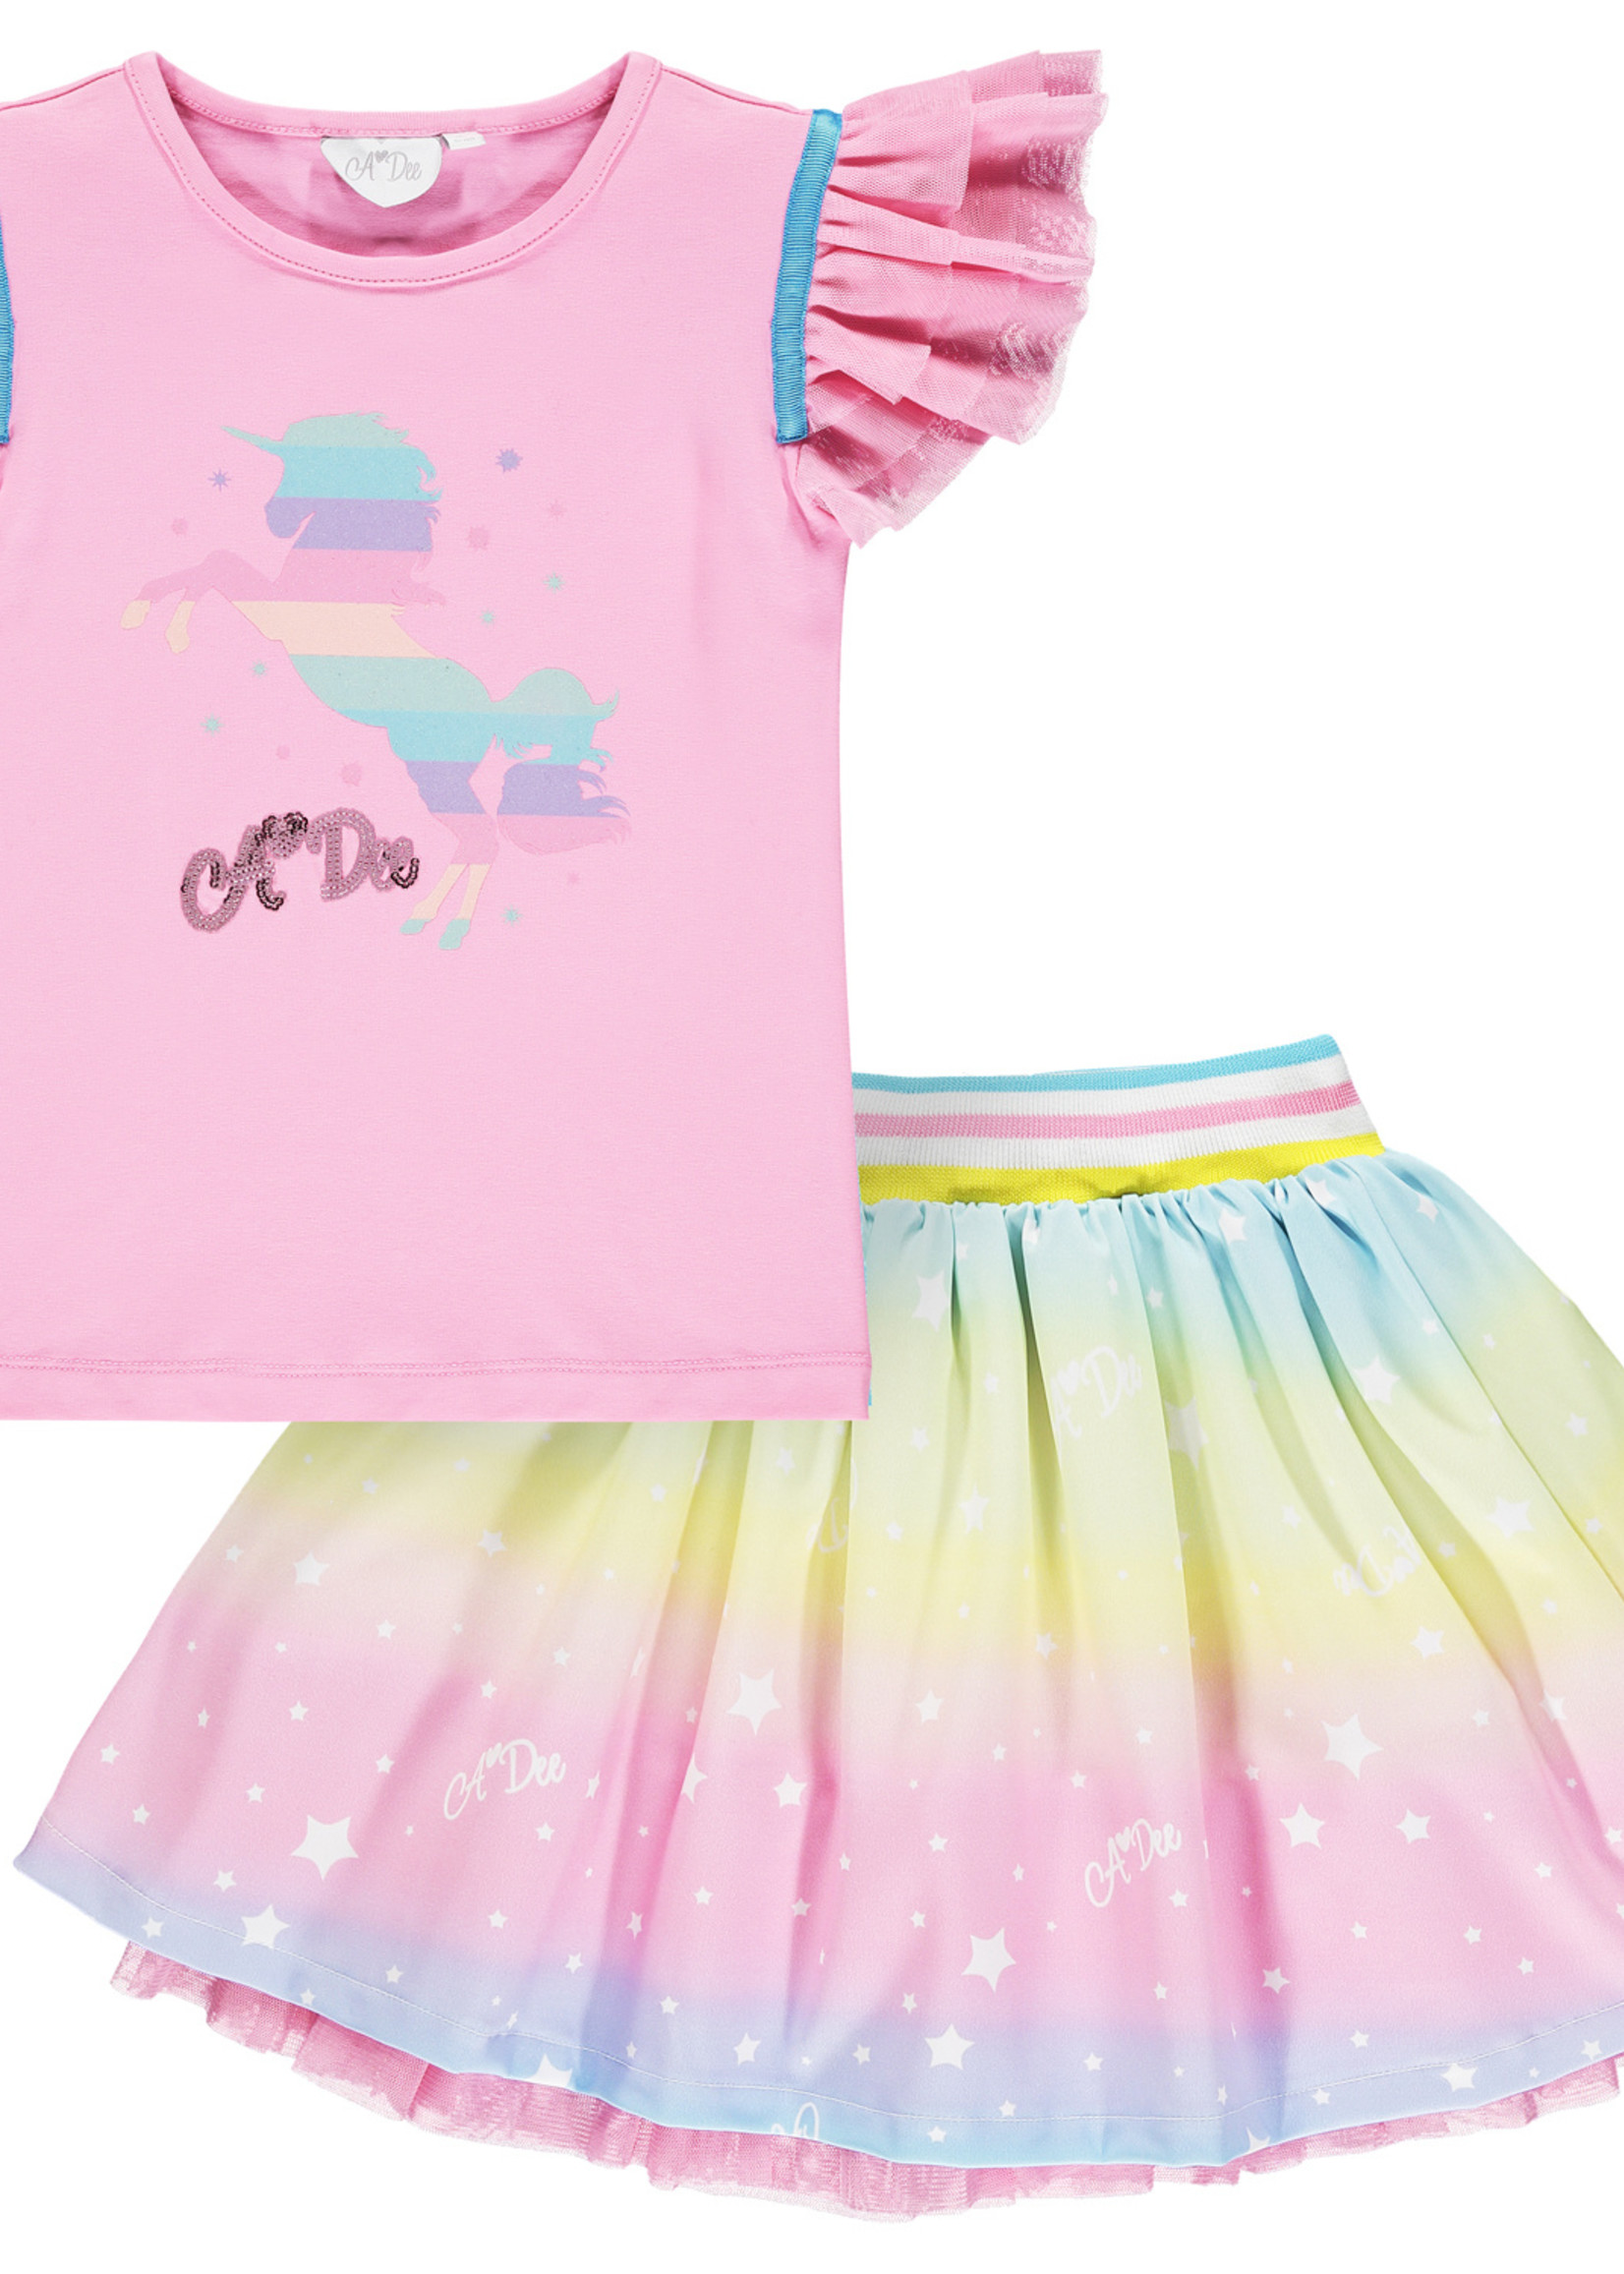 A Dee Nicky pink Rainbow unicorn t shirt